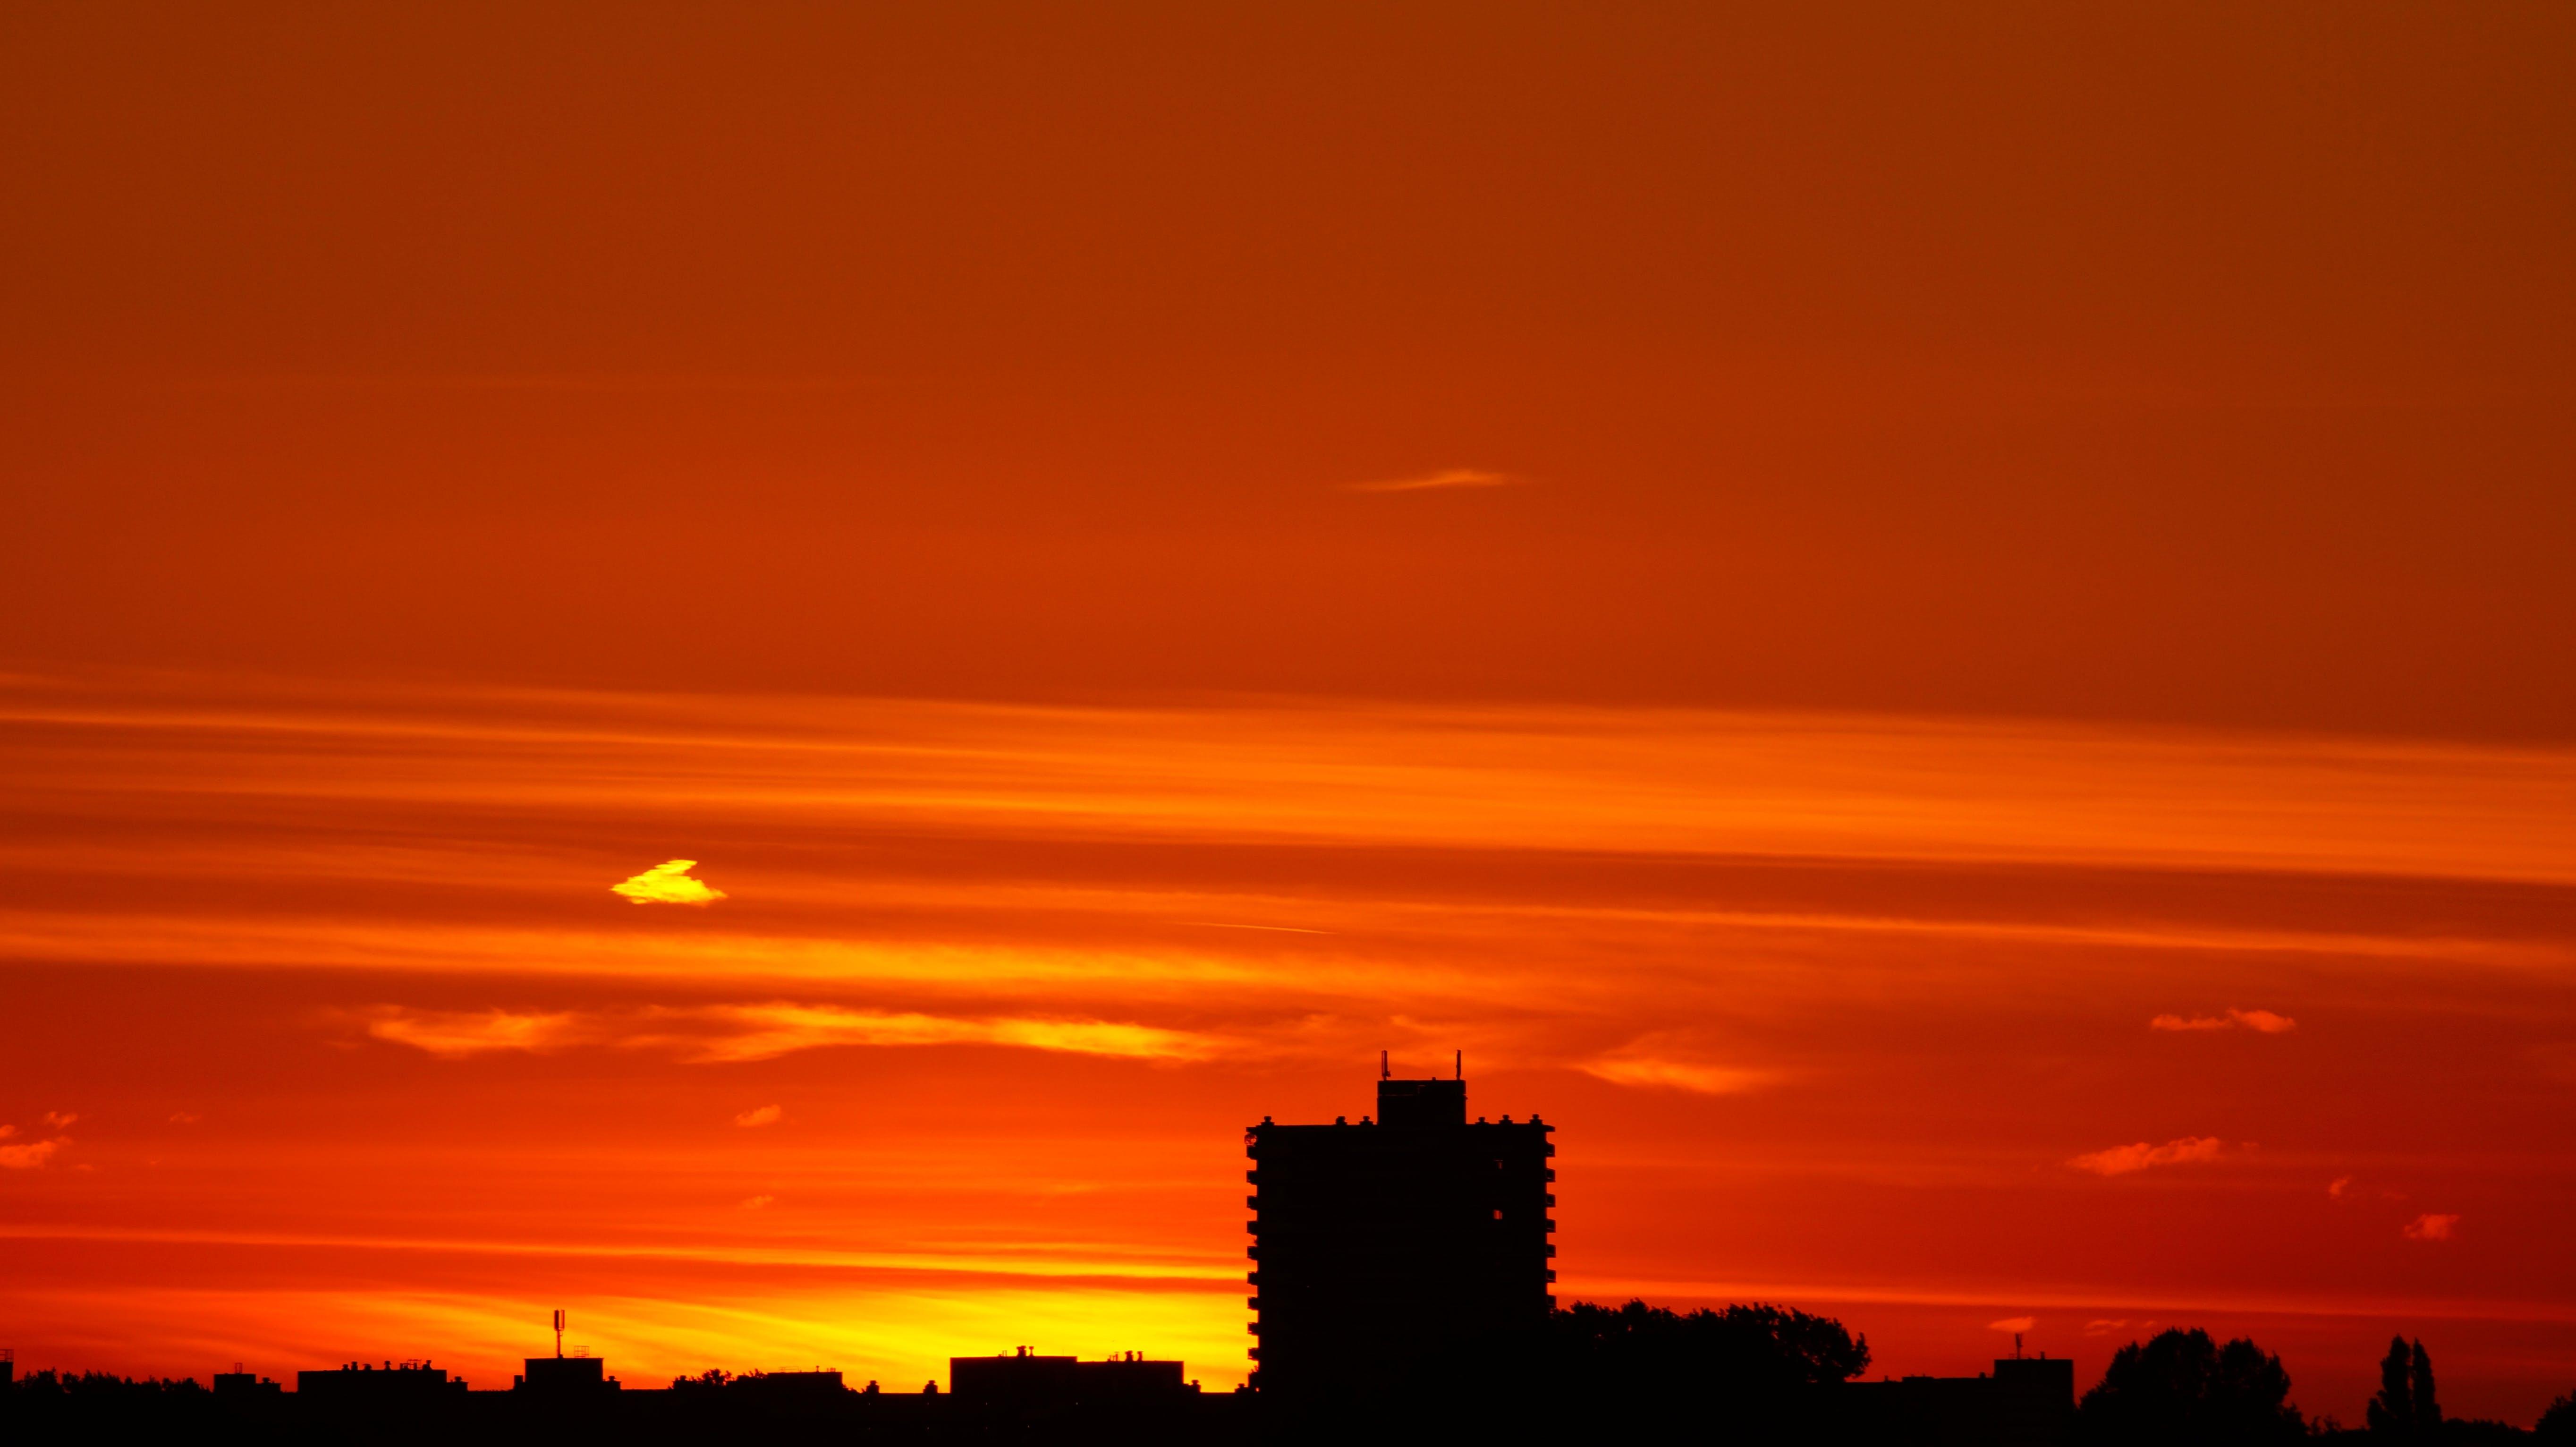 Sunset over City Skyline